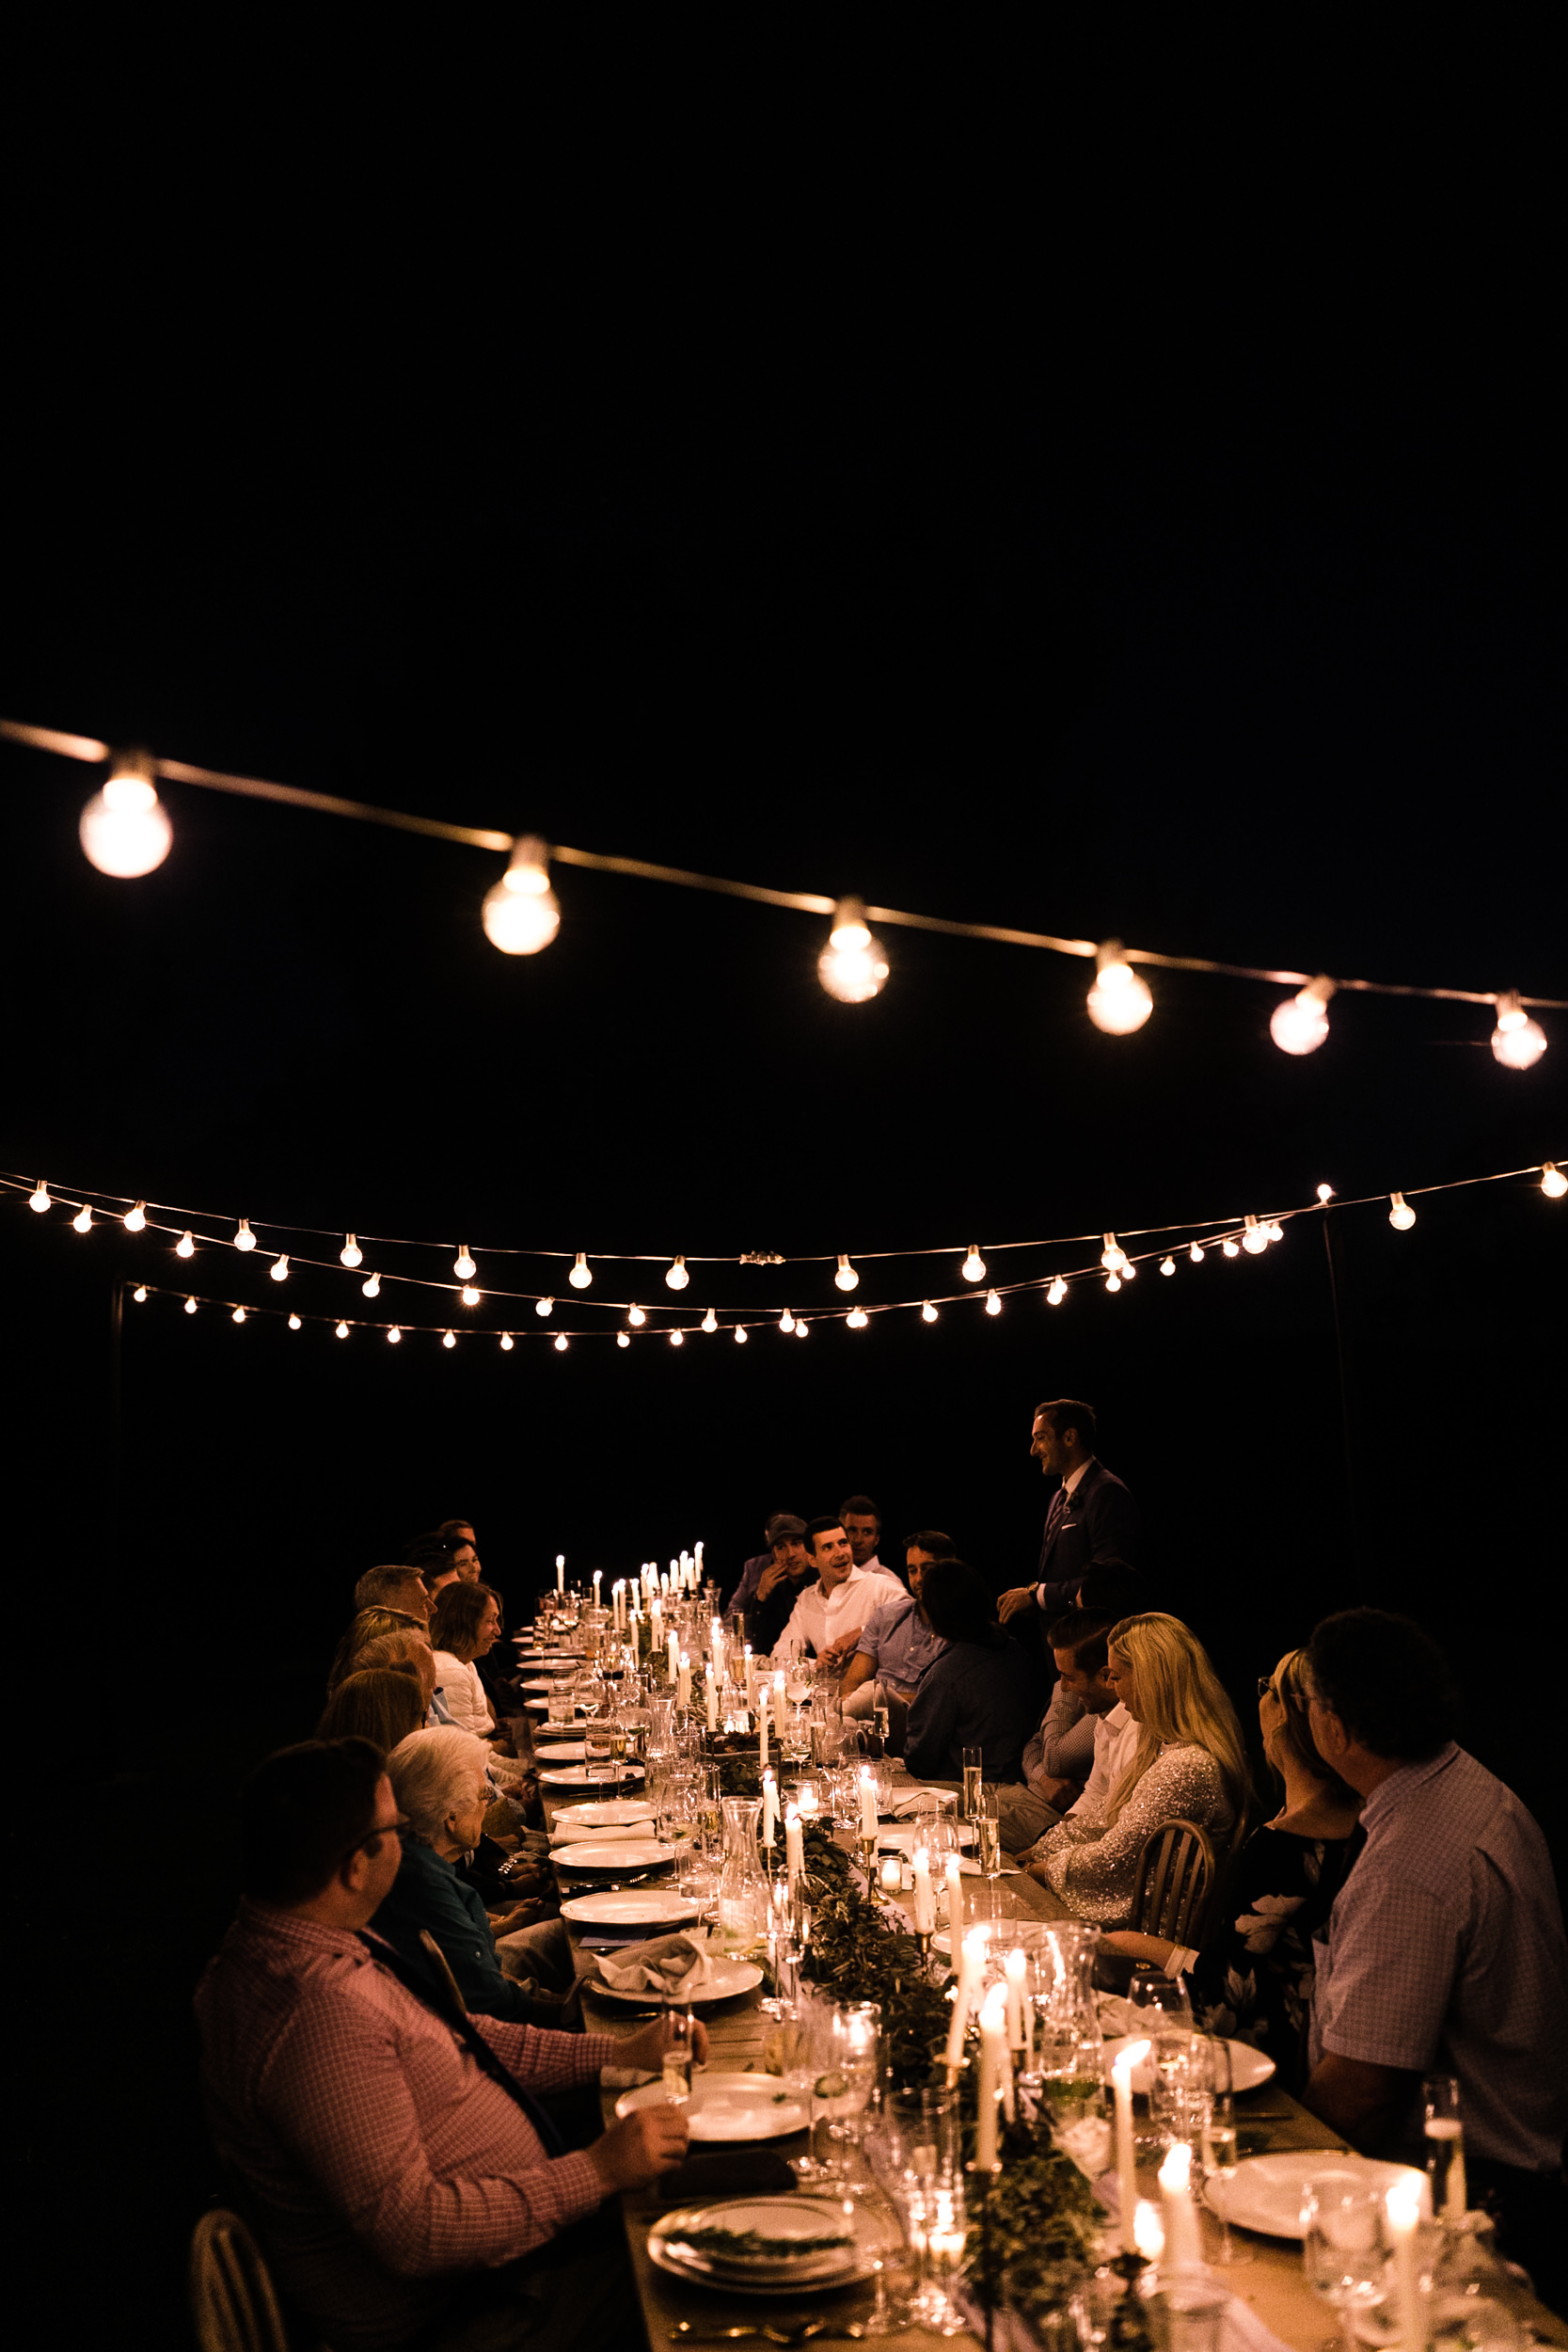 Erika + Grant's intimate Yosemite National Park destination wedding + romantic backyard reception under twinkle lights | the hearnes adventure photography